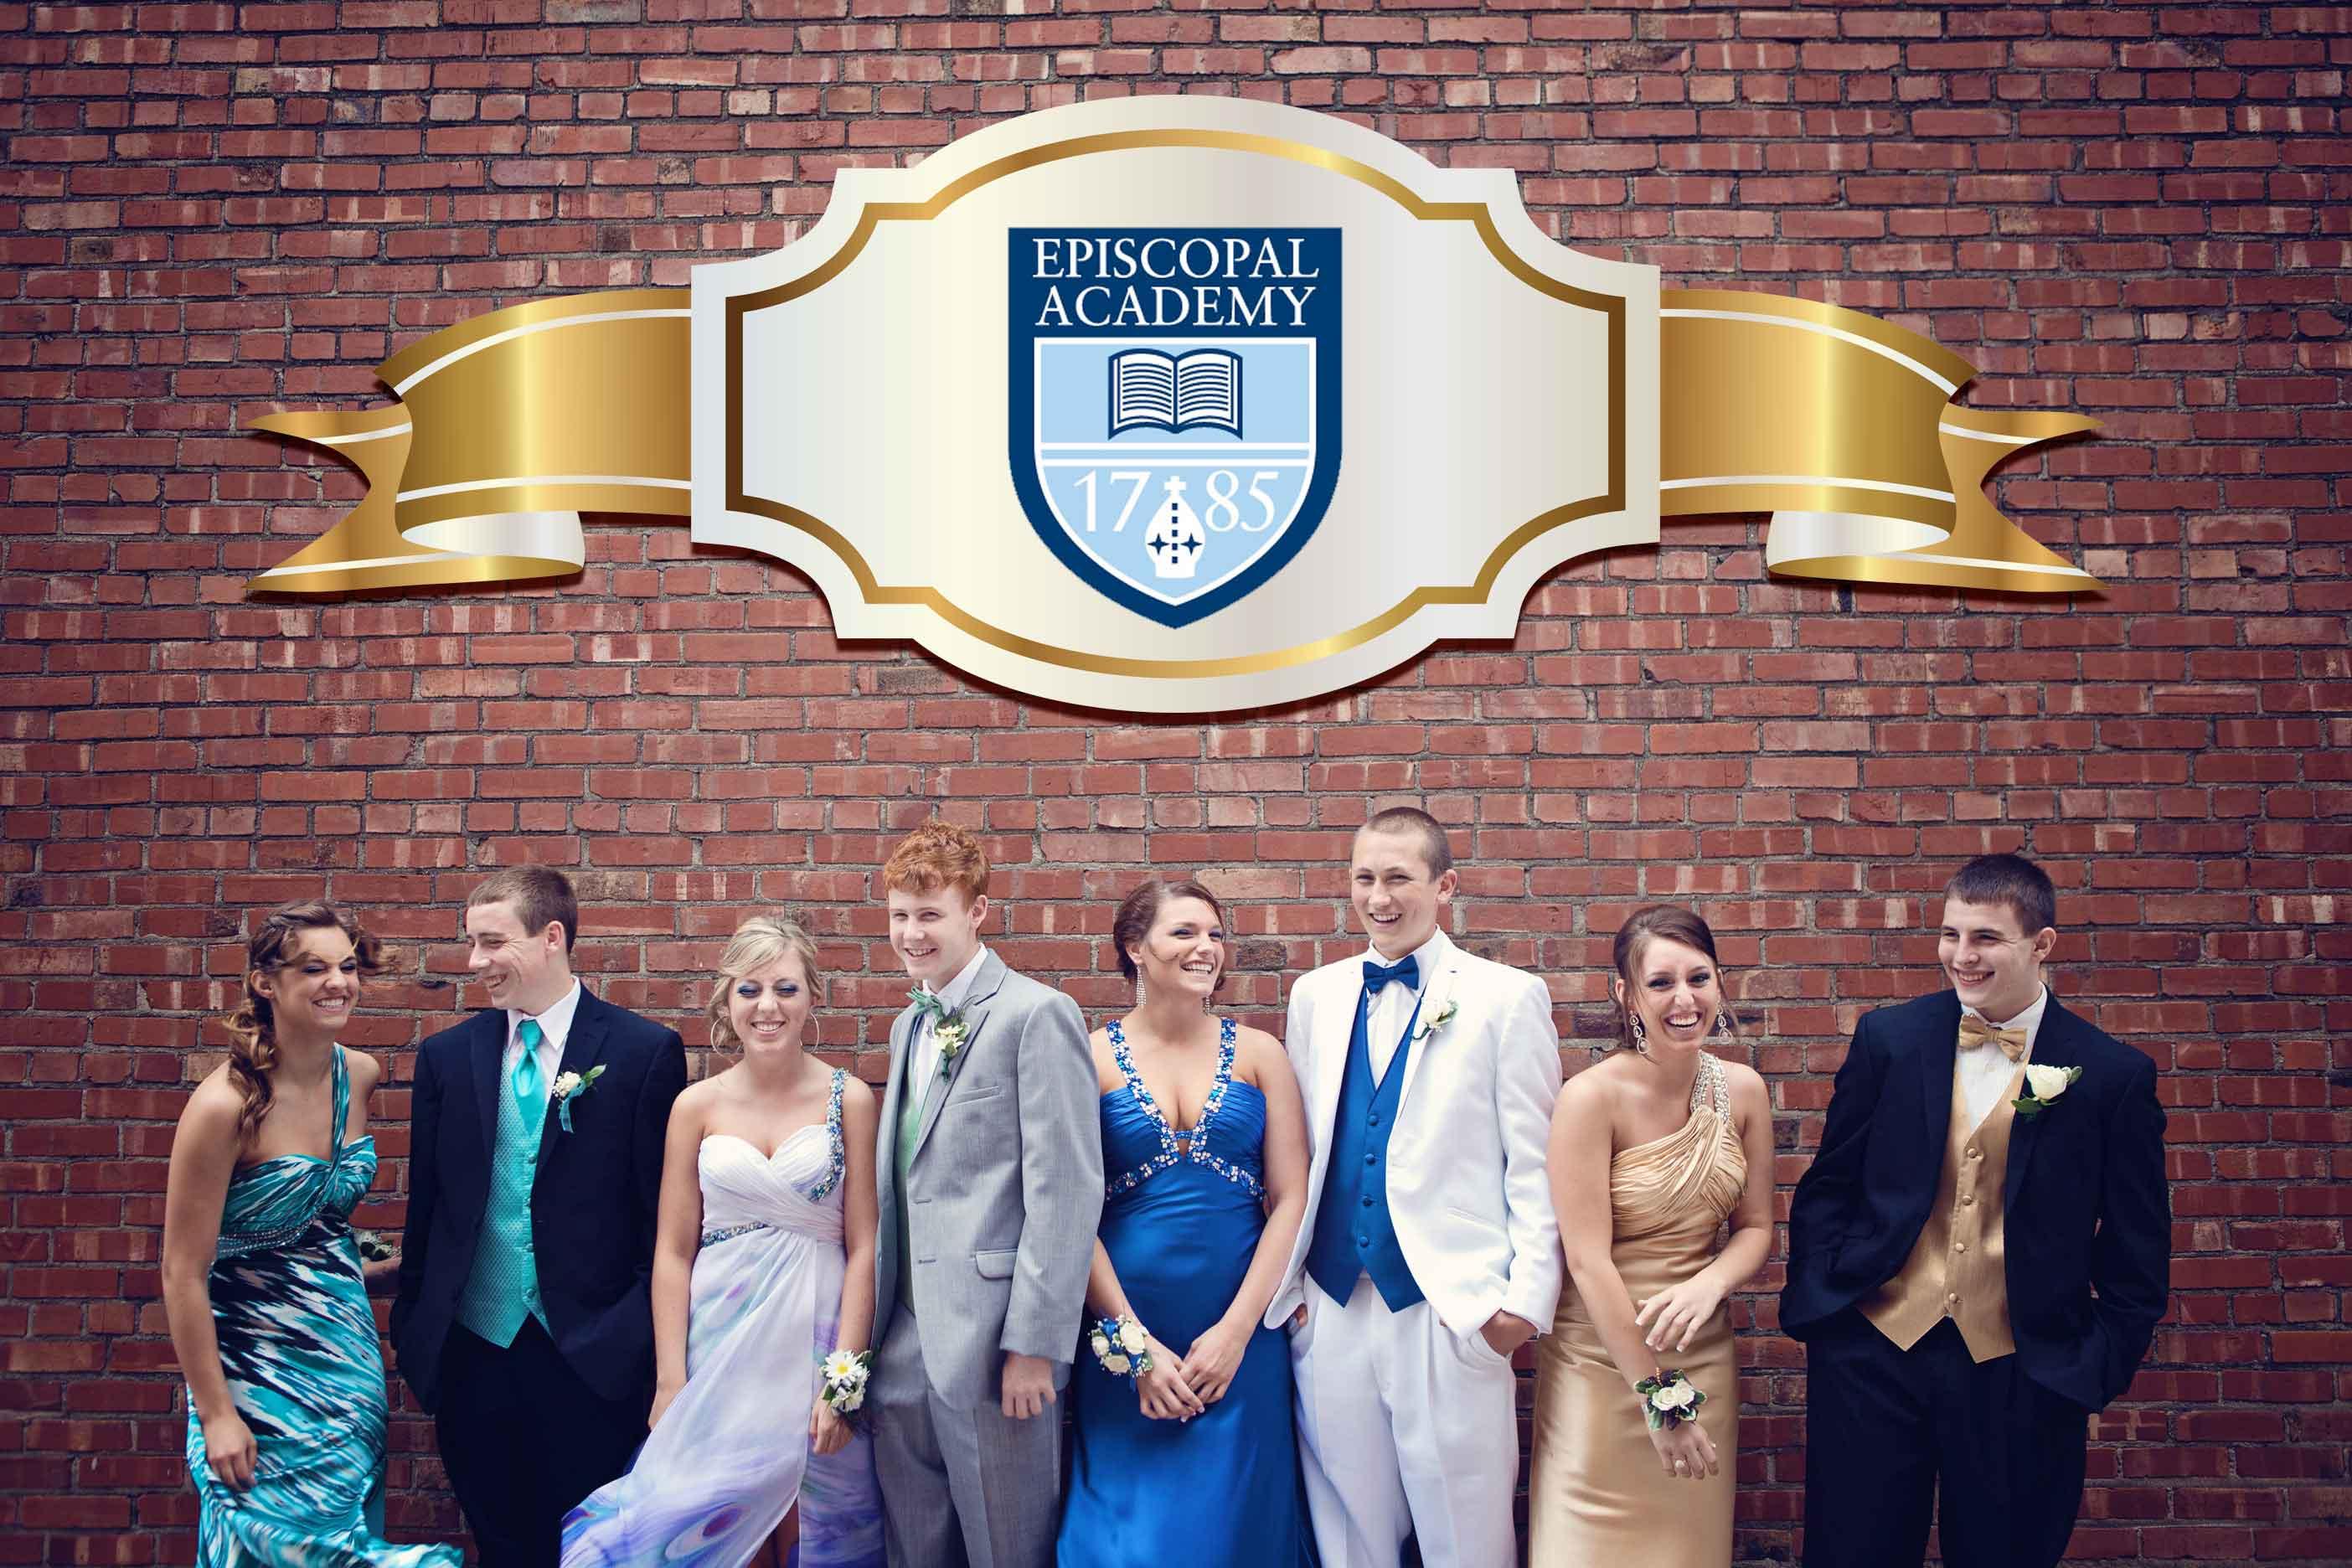 episcopal academy prom